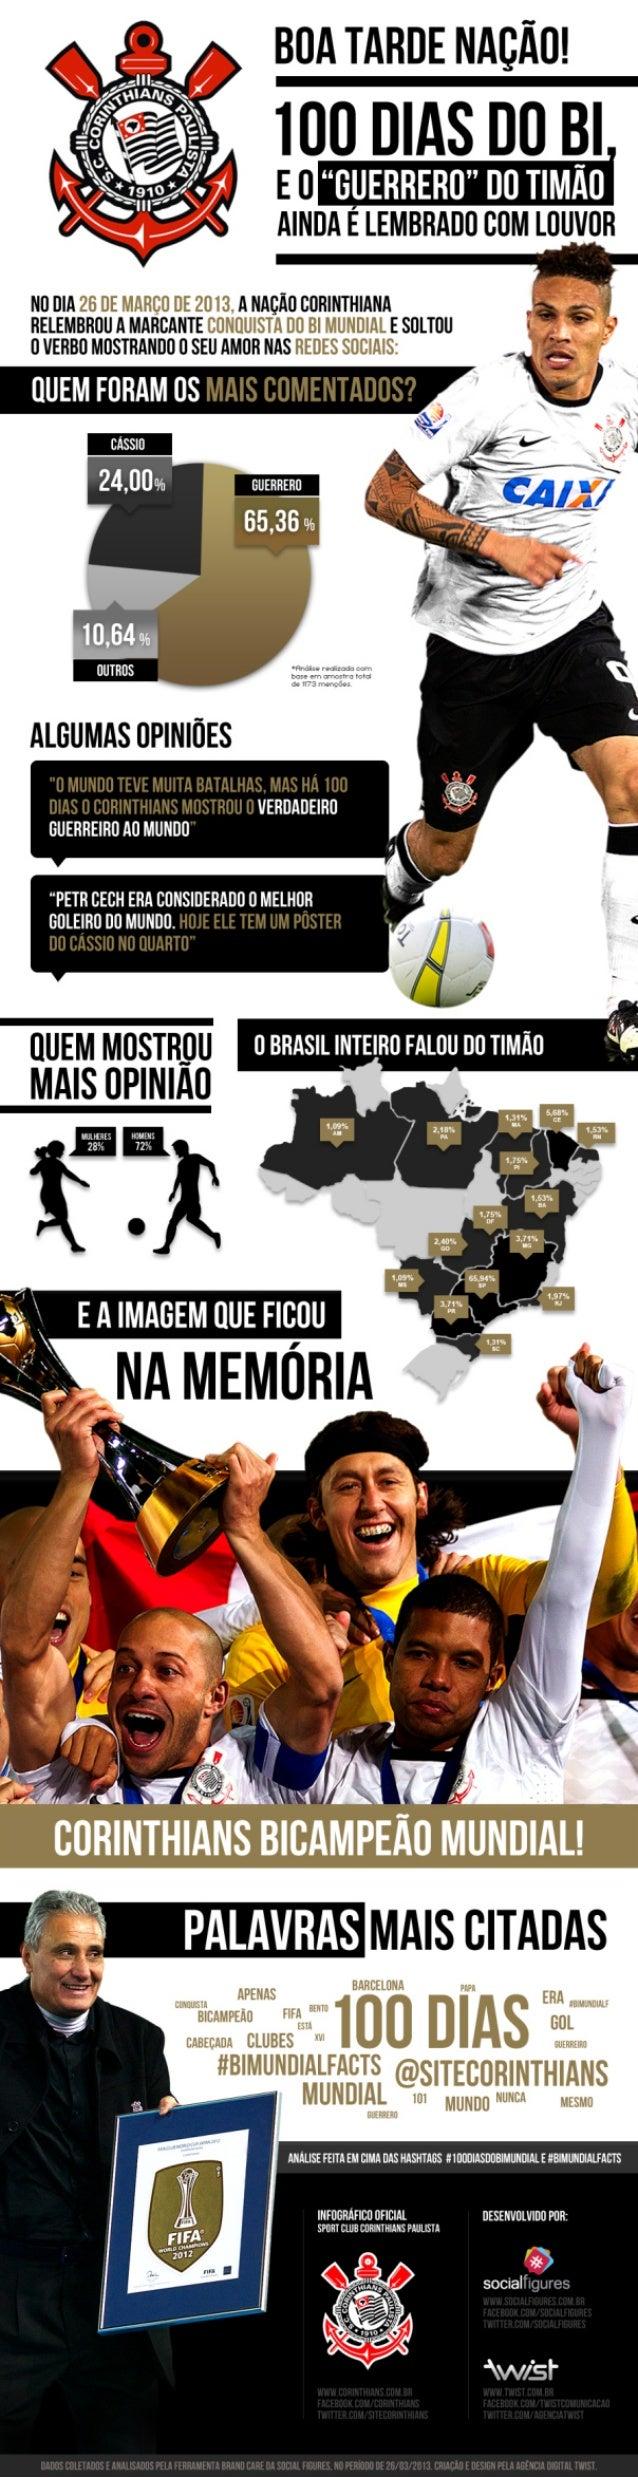 Corinthians nas Redes Sociais: 100 Dias do Bicampeonato Mundial de Clubes